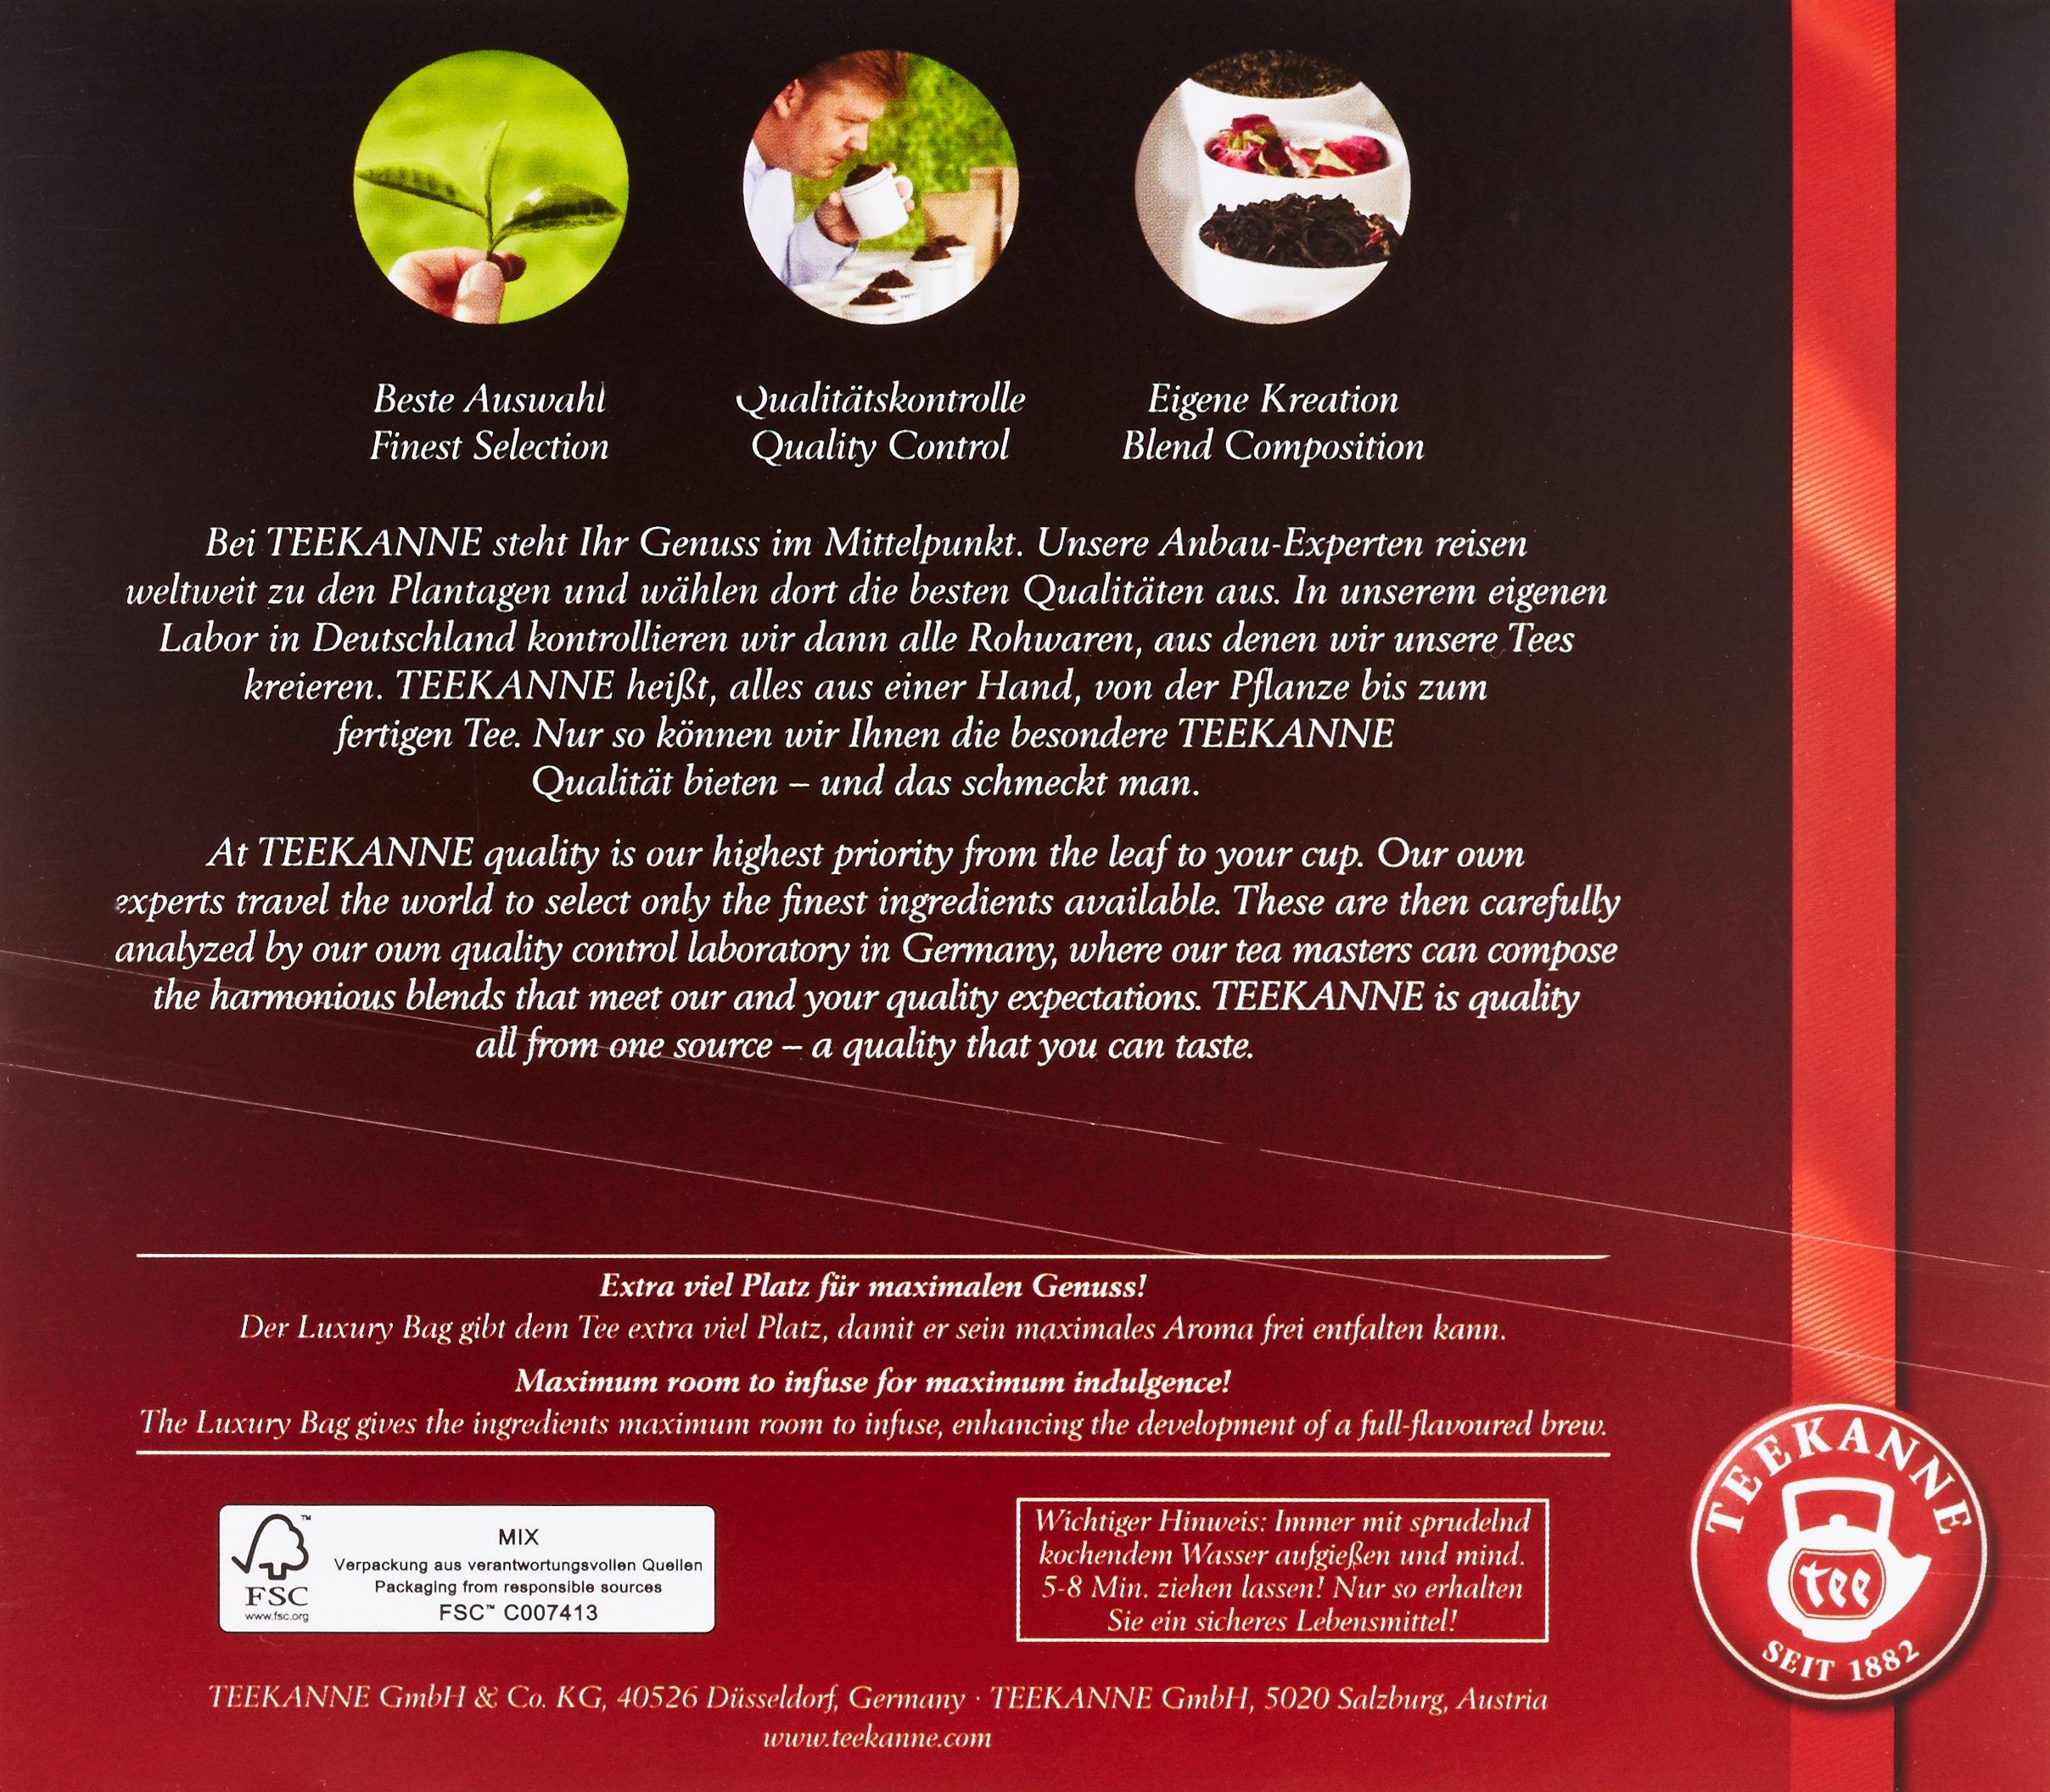 Teekanne-Selection-1882-im-Luxury-Bag-Fruit-Selection-fruchtig-frisch-20-Portionen-1er-Pack-1-x-110-g